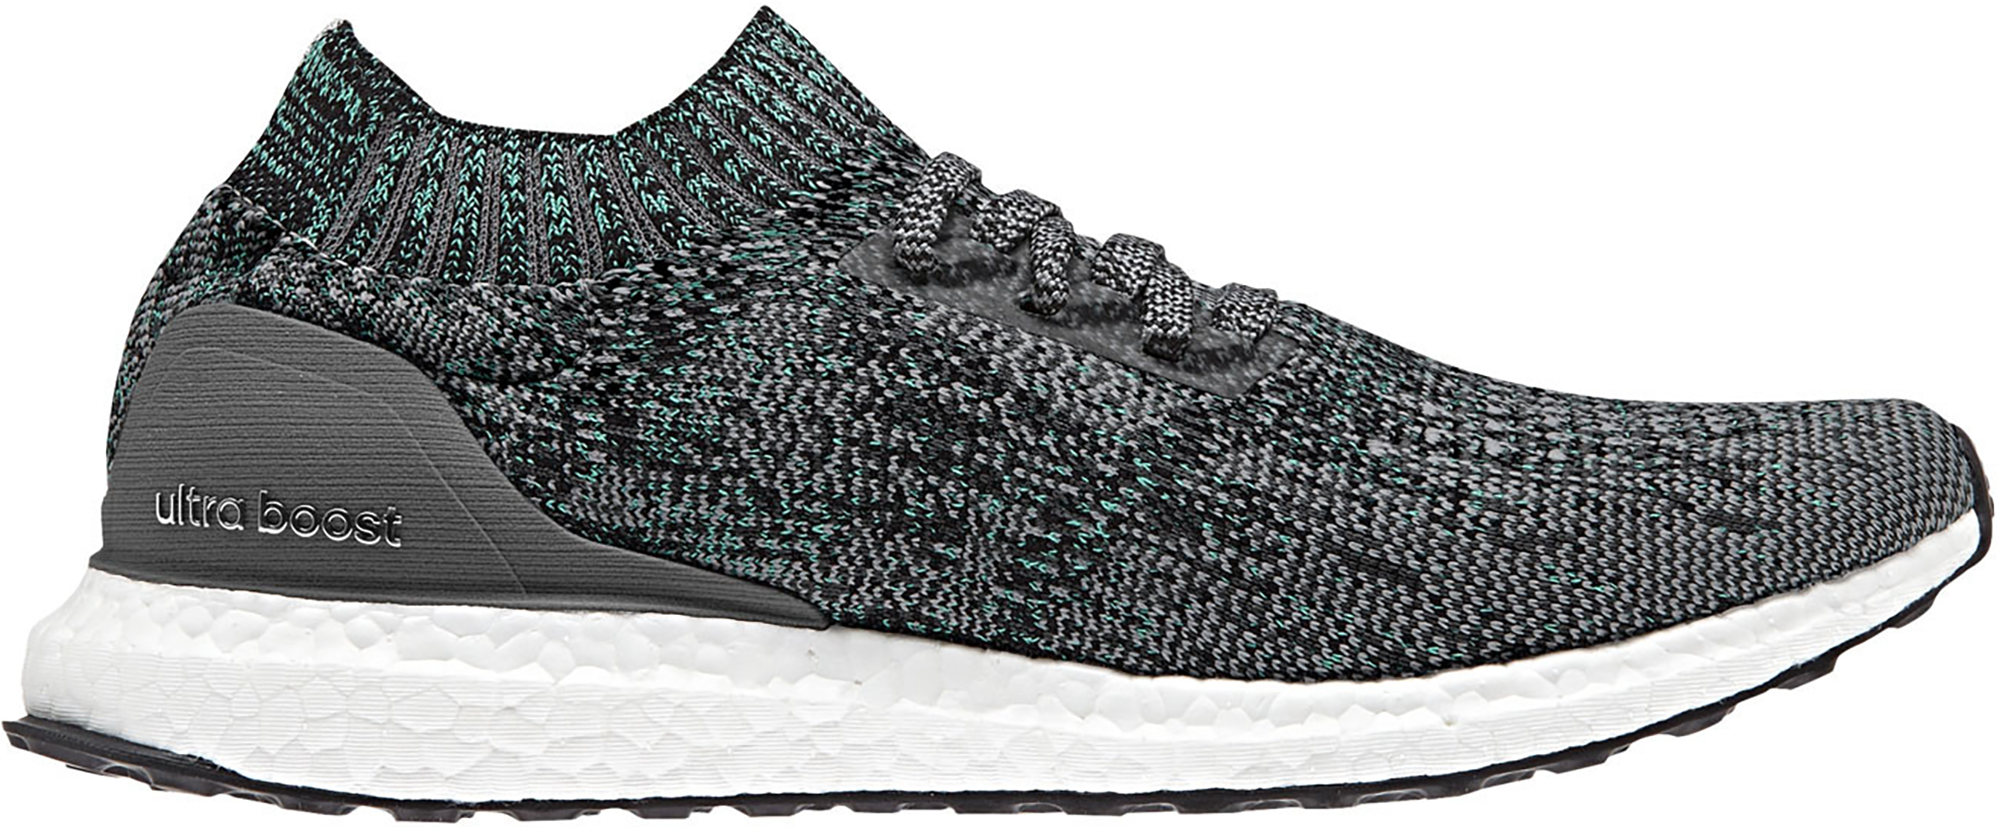 adidas Ultra Boost Uncaged Grey Green